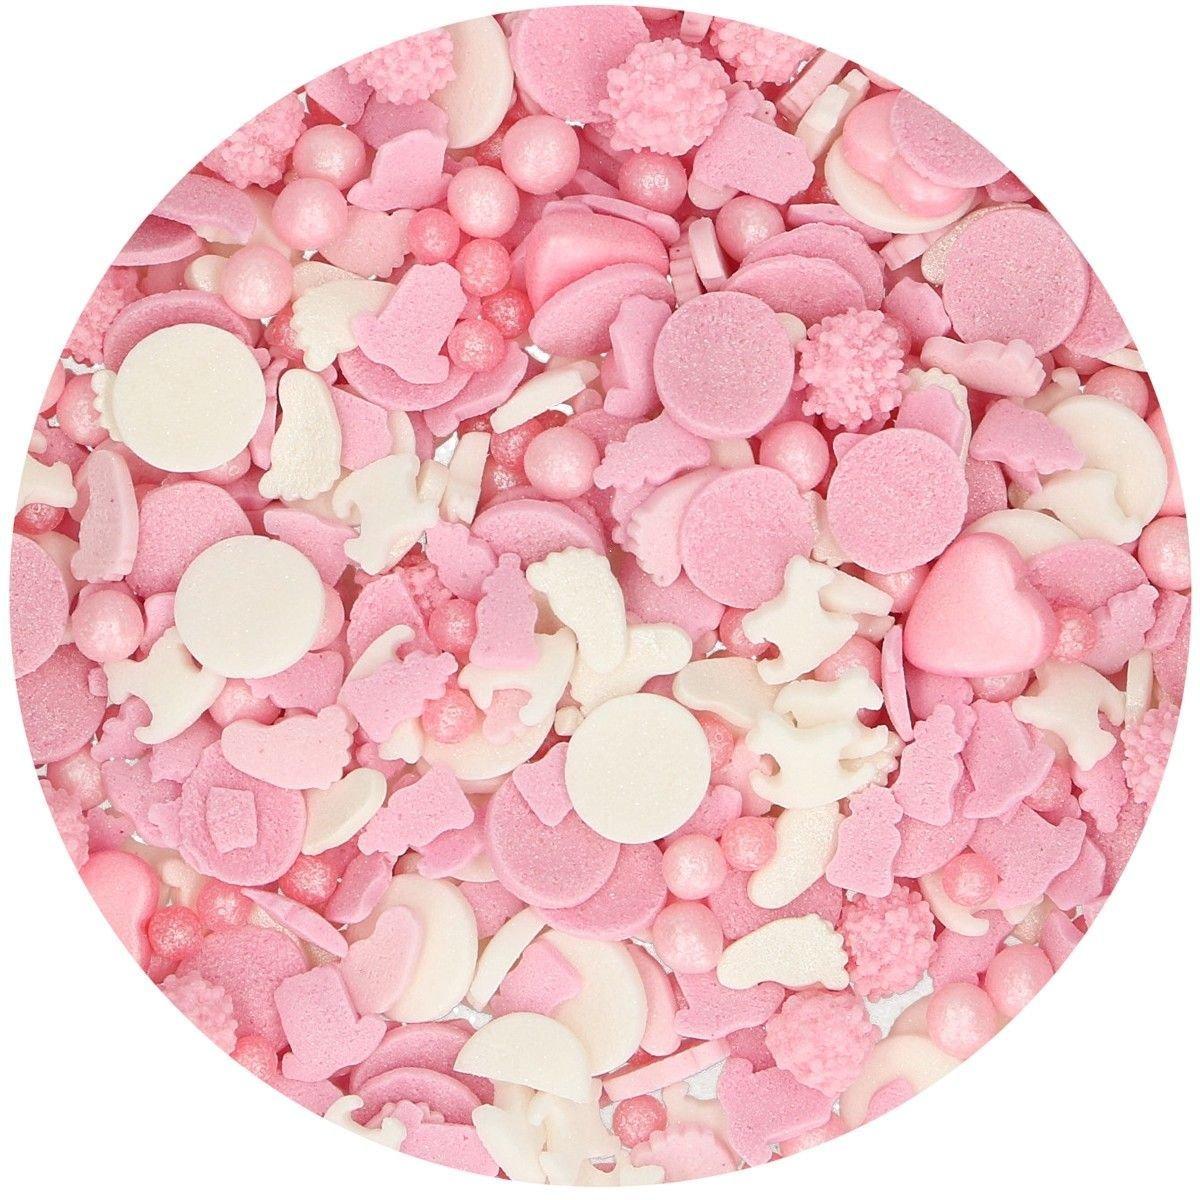 FunCakes -Sprinkle Mix Baby Girl Medley - Κονφετί Ροζ & Λευκό -180γρ